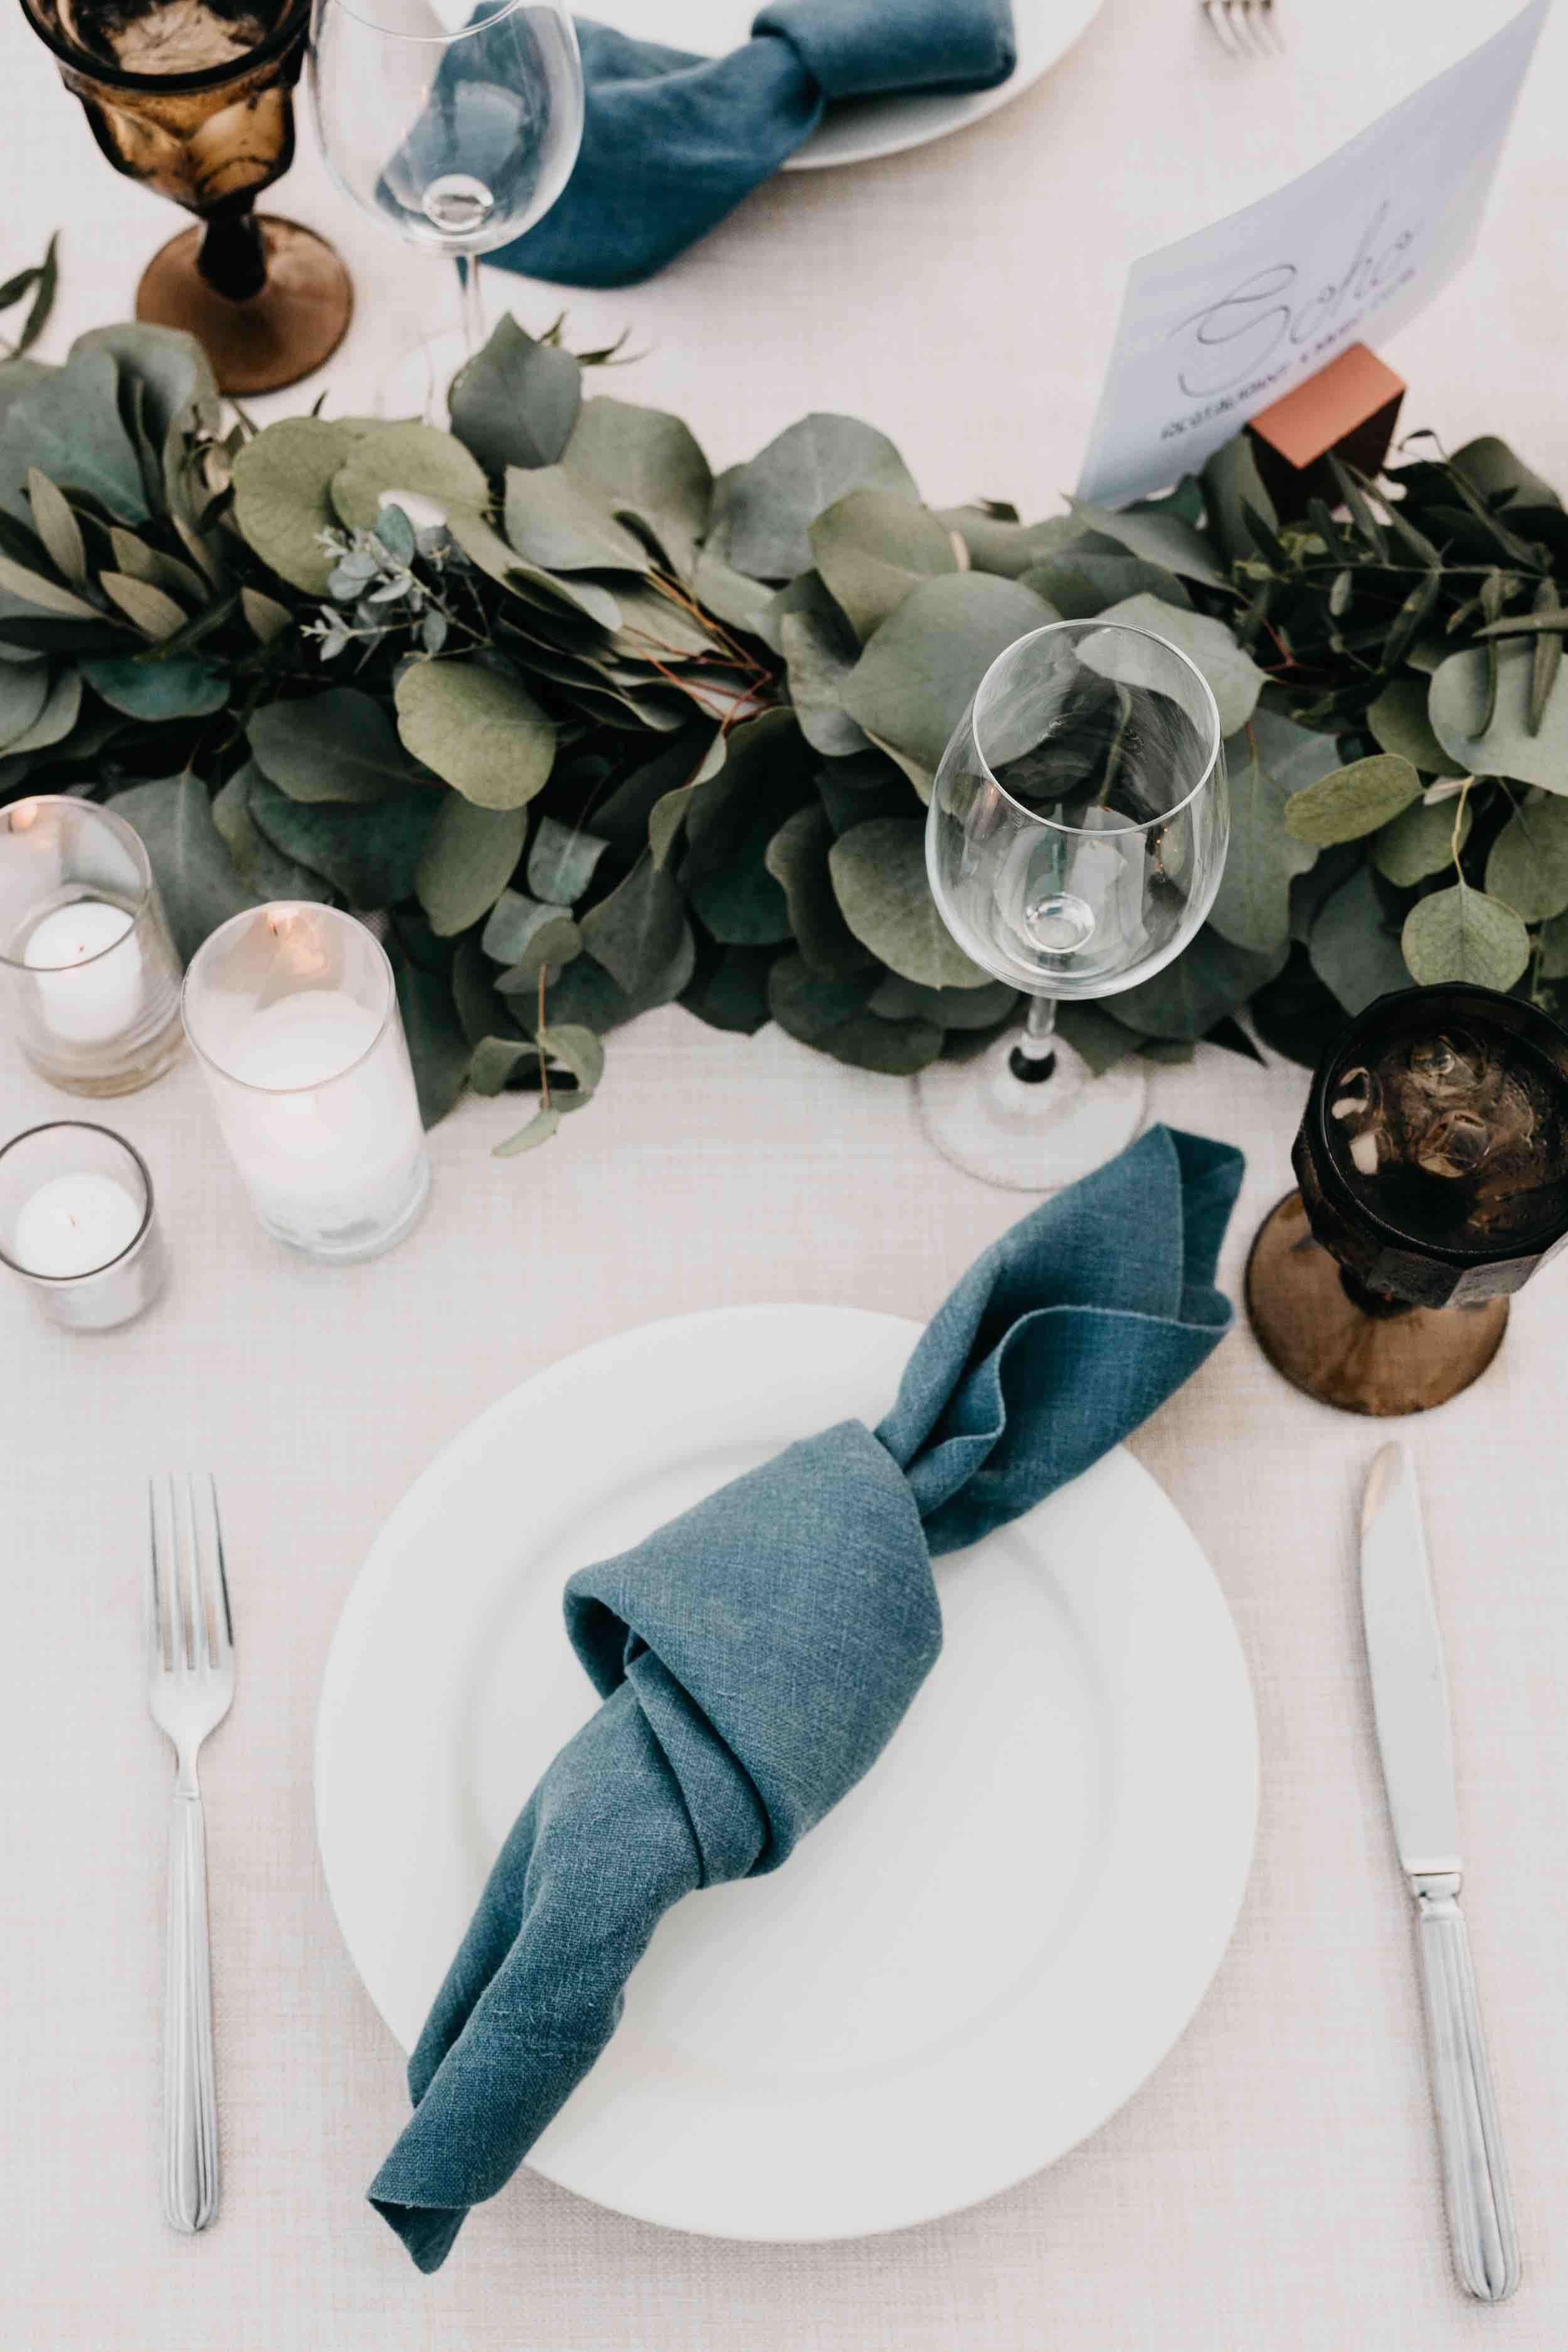 Wedding decorations 2019  Napkin  EuJ Wedding   Pinterest  Napkins Wedding and